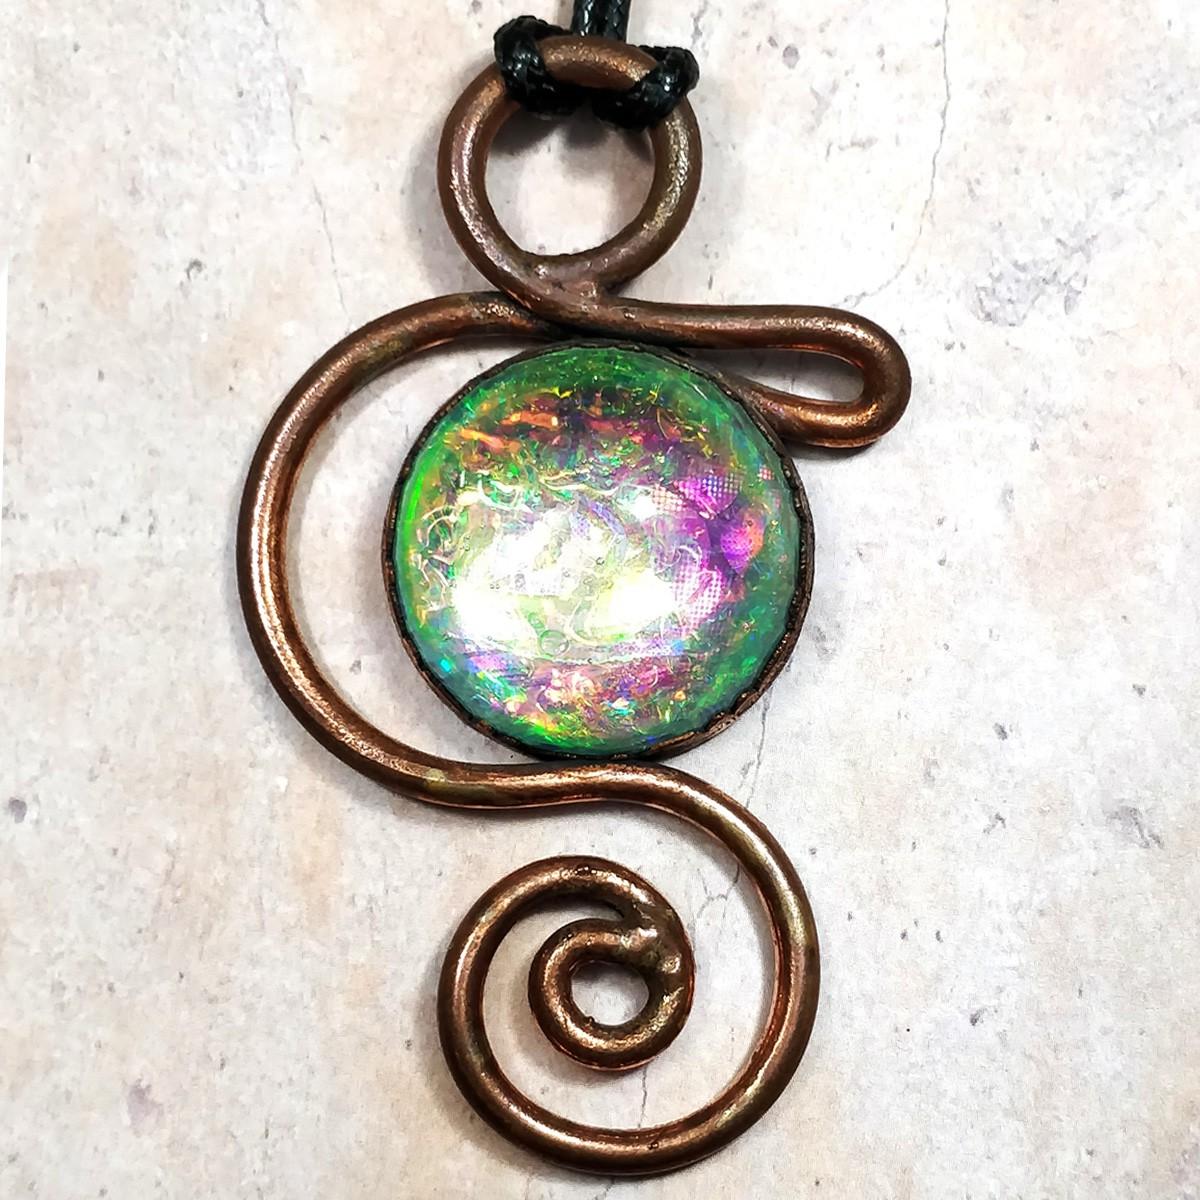 Pendentif volute arabesque cuivre rêve constellation  irisé holographique